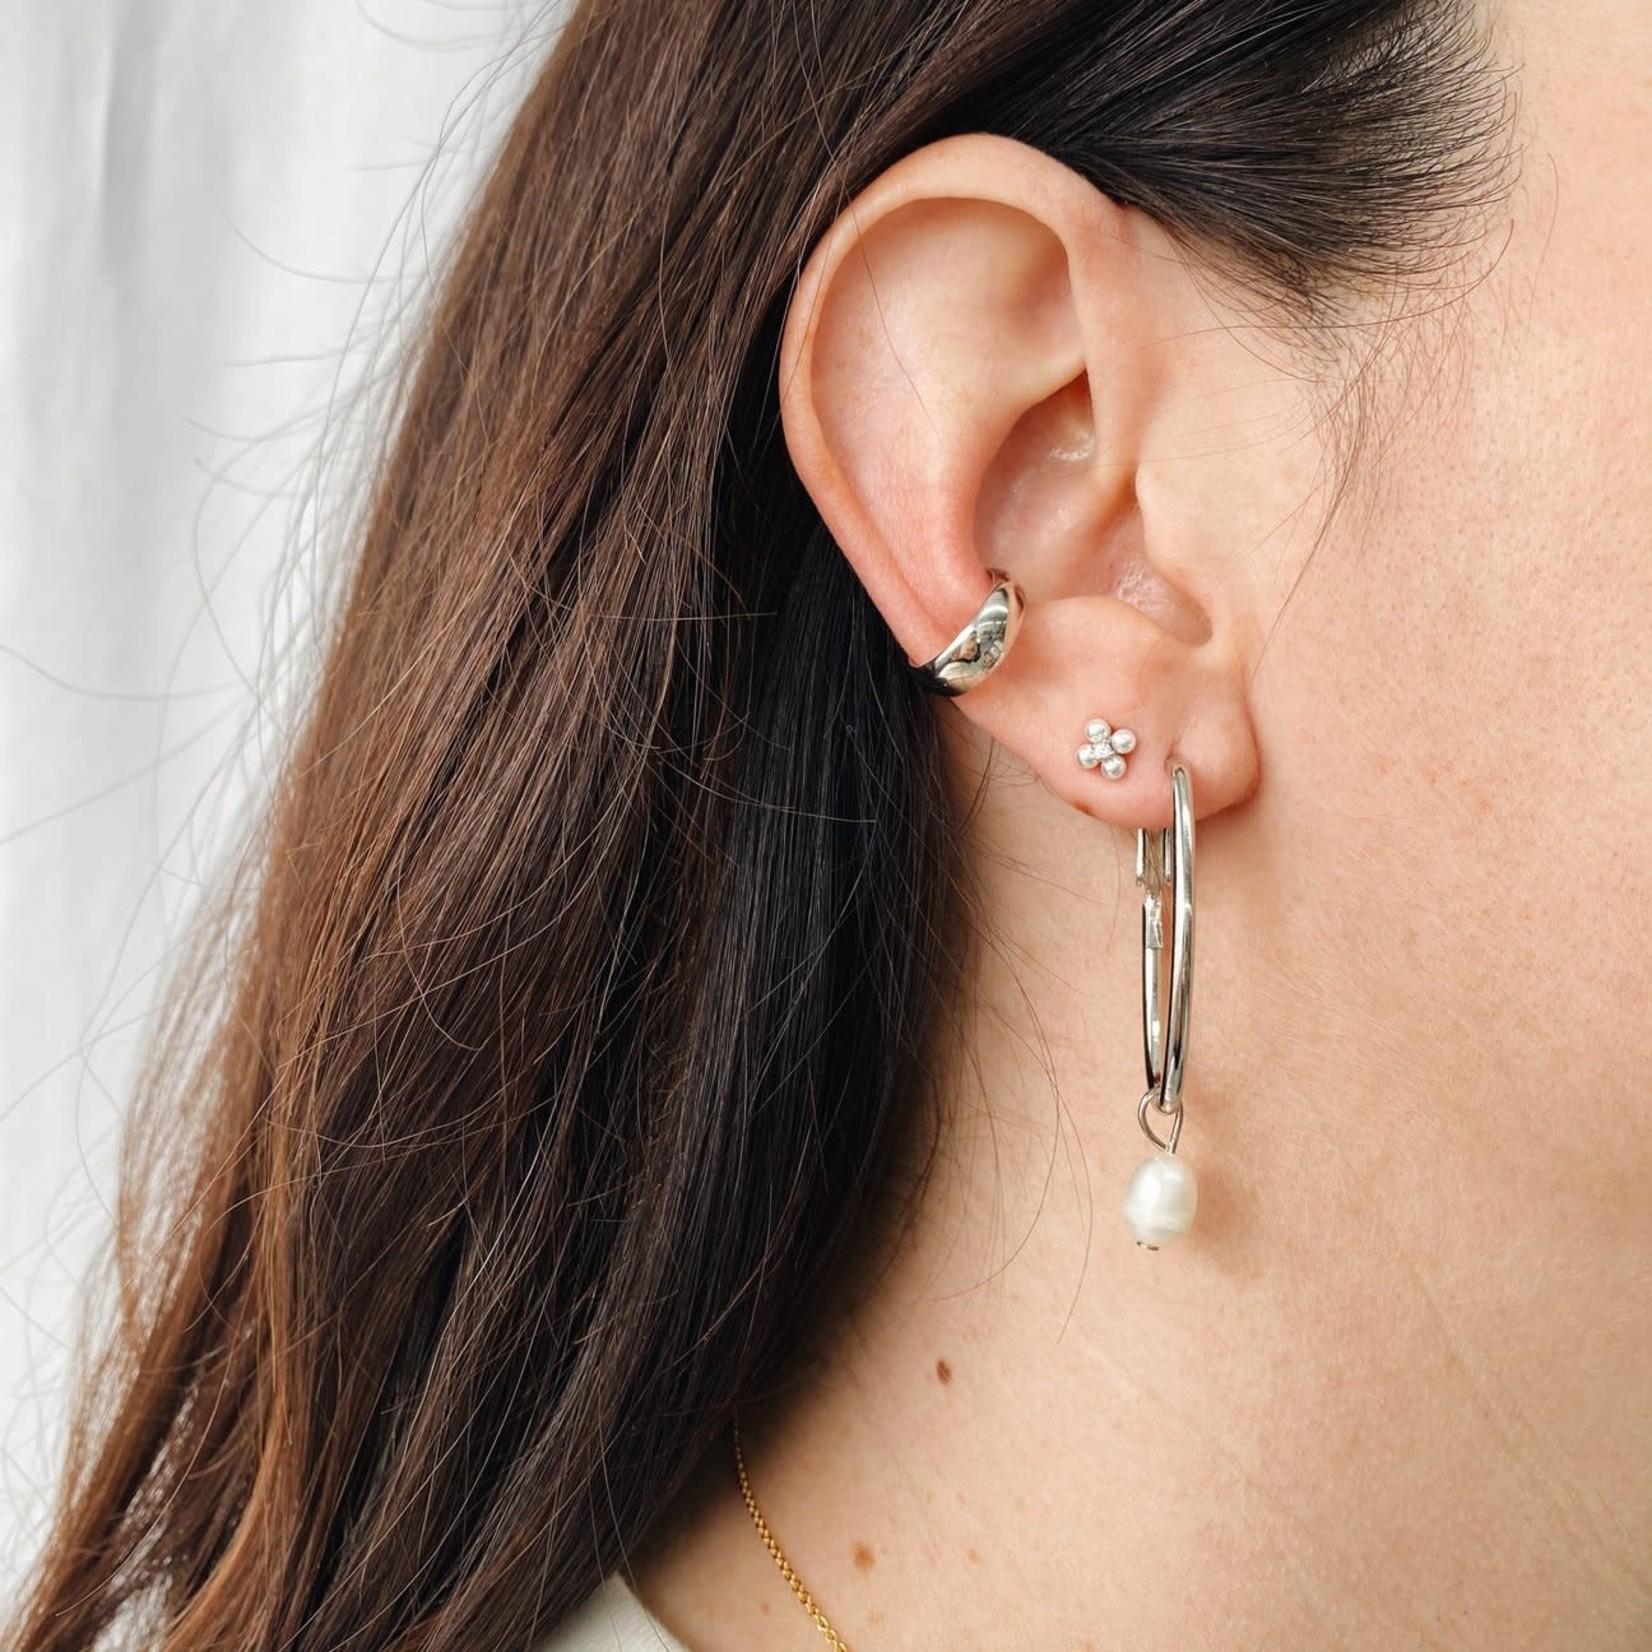 Horace Jewelry Horace fausse boucle d'oreille BOLD ARGENT